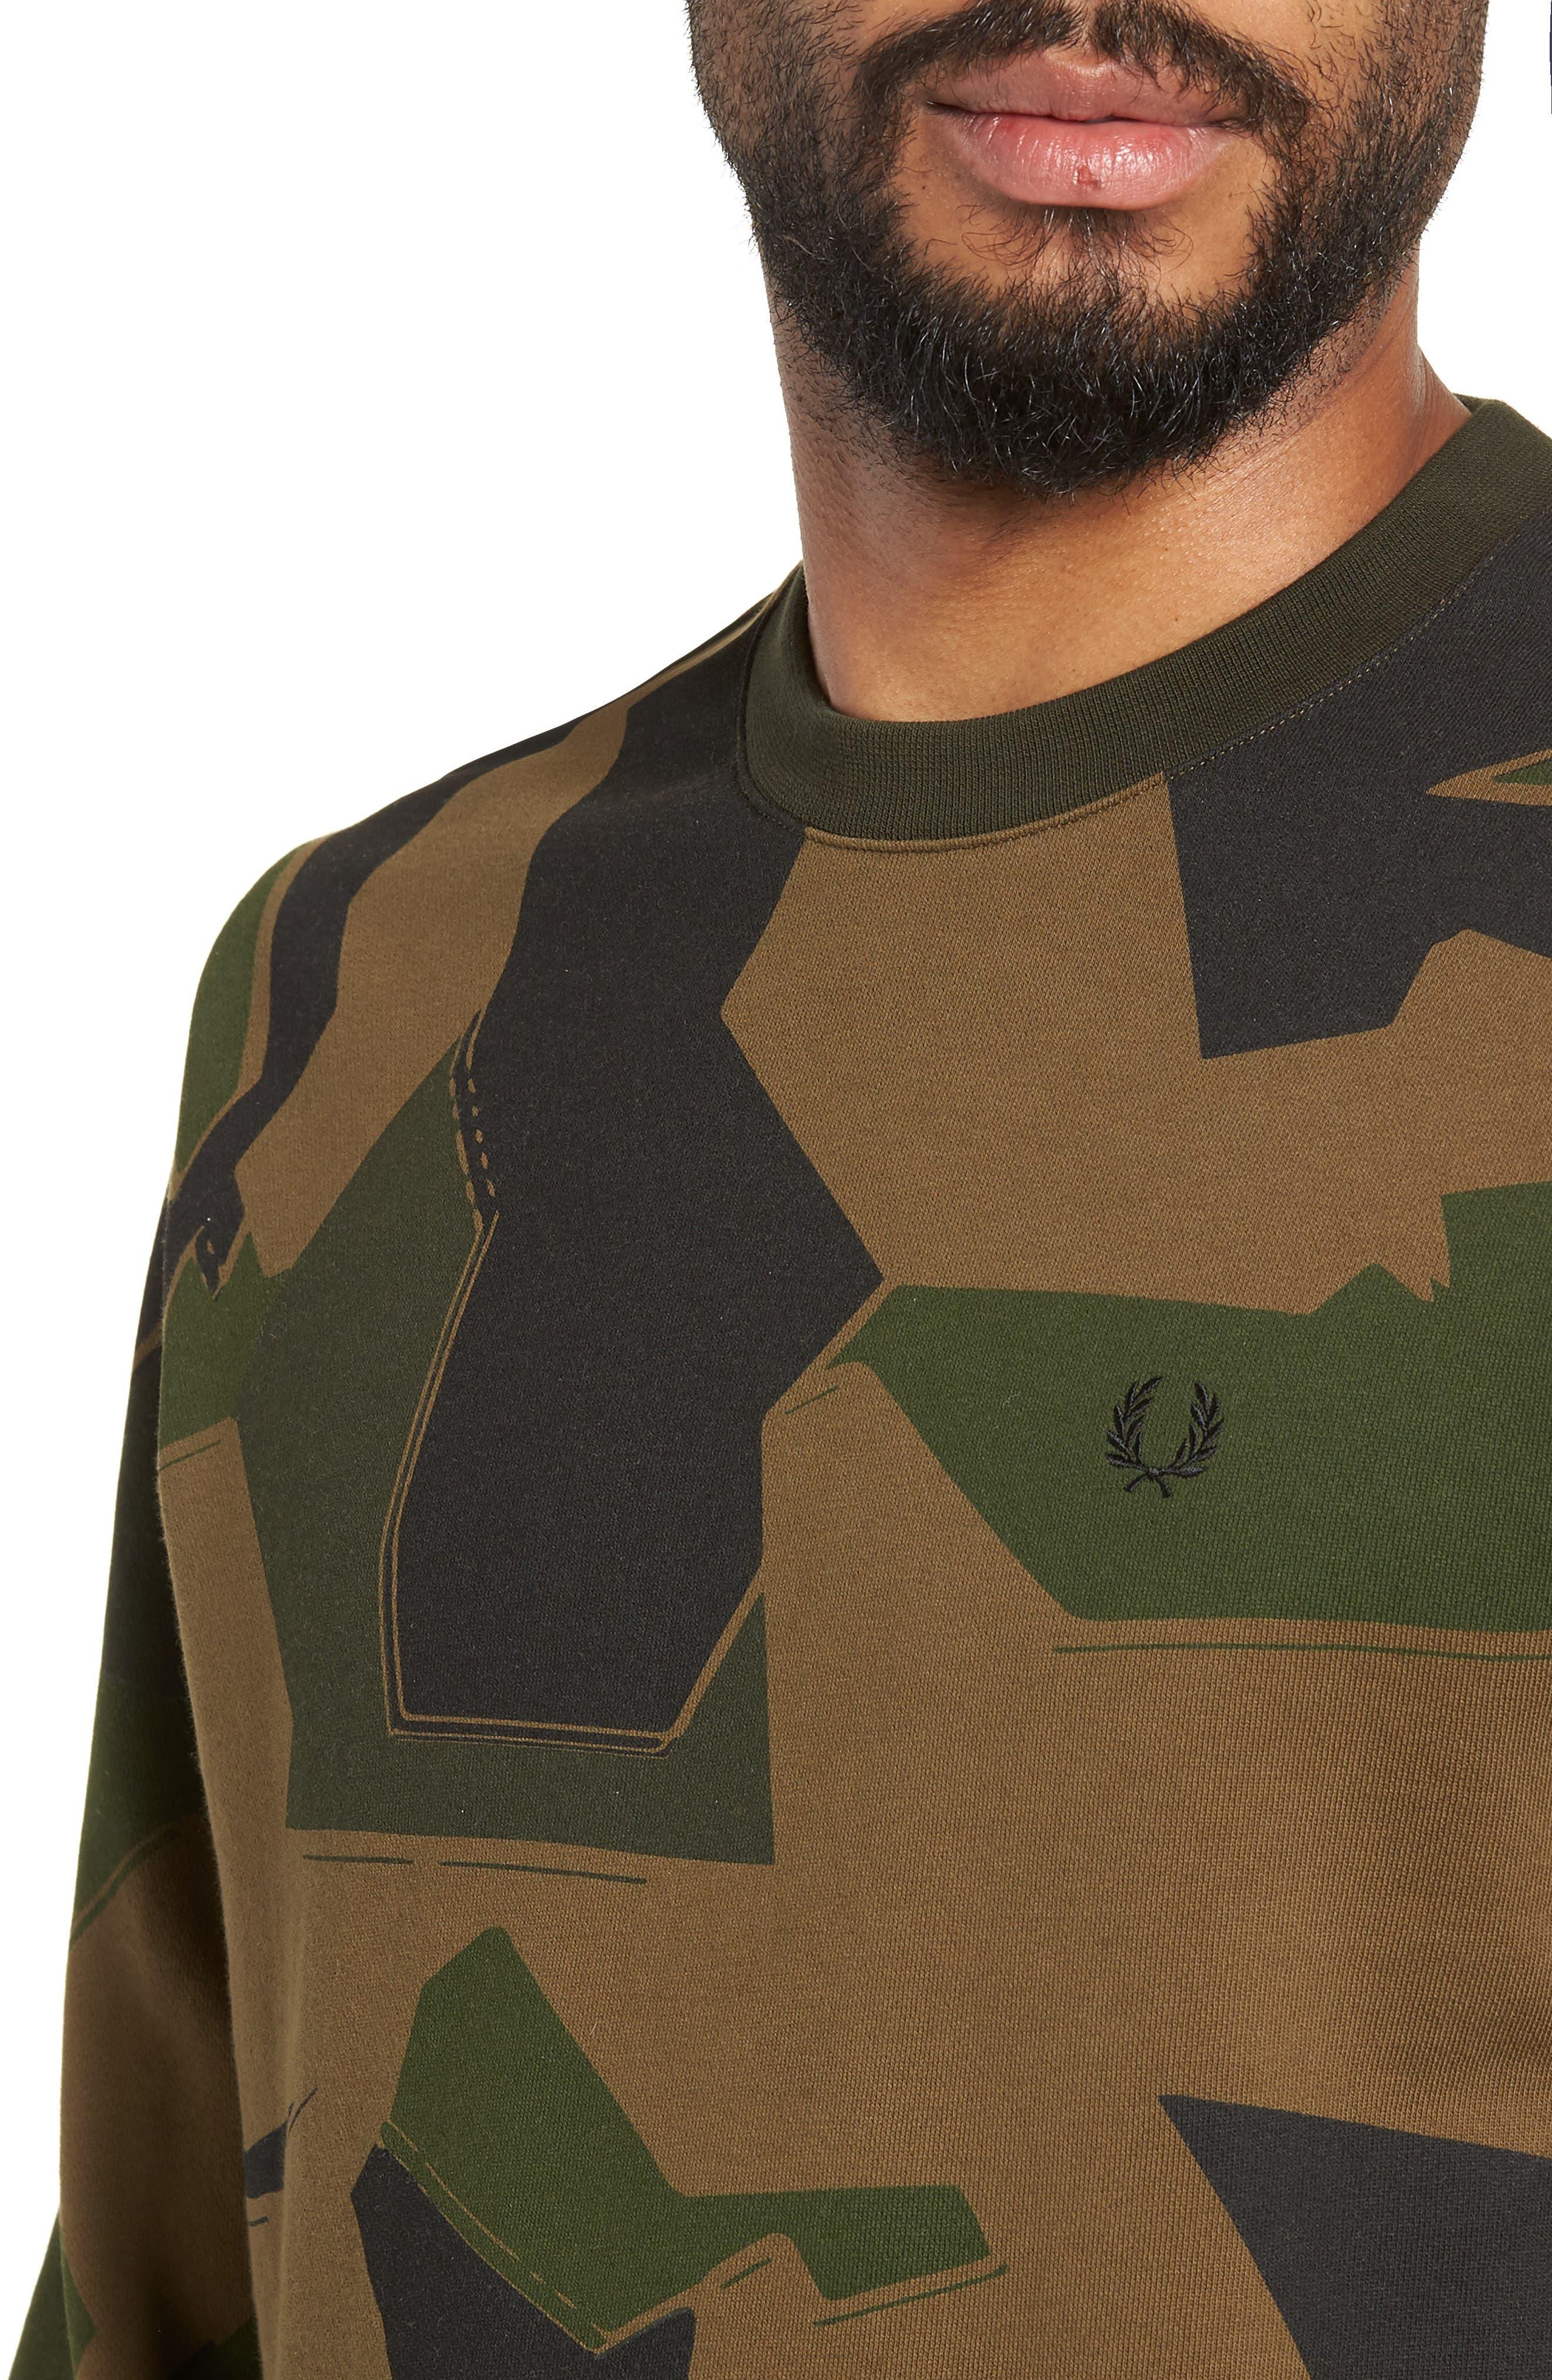 Camoflage Sweatshirt,                             Alternate thumbnail 4, color,                             WOODLAND CAMO